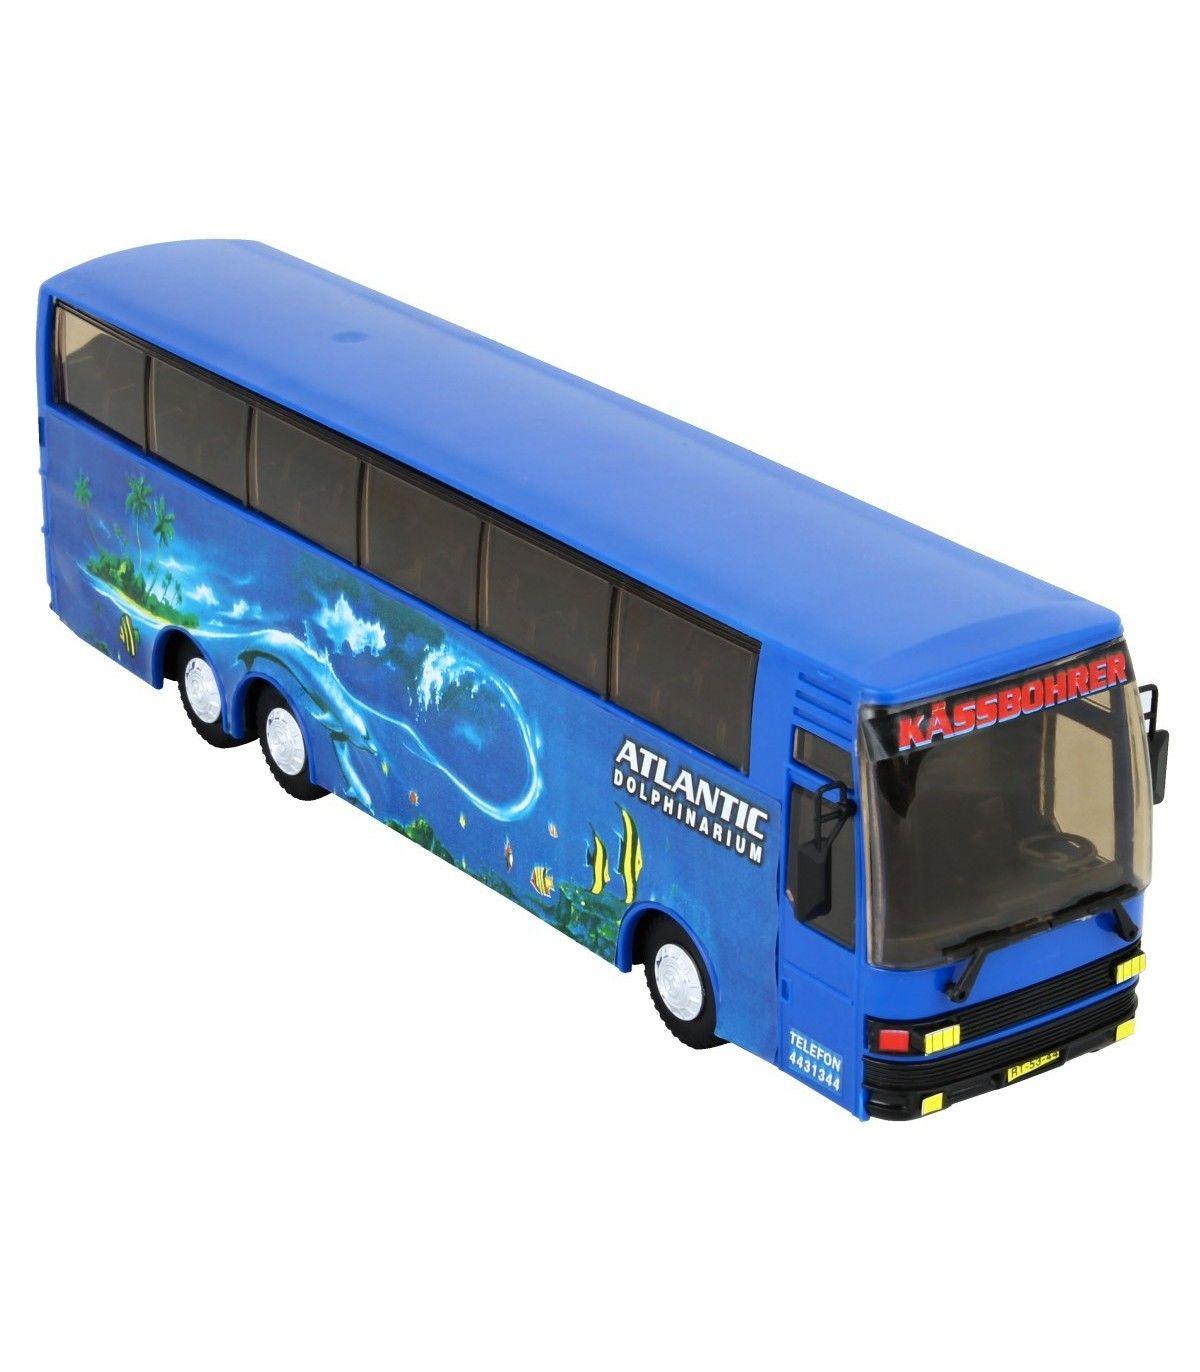 Monti system Vehicles